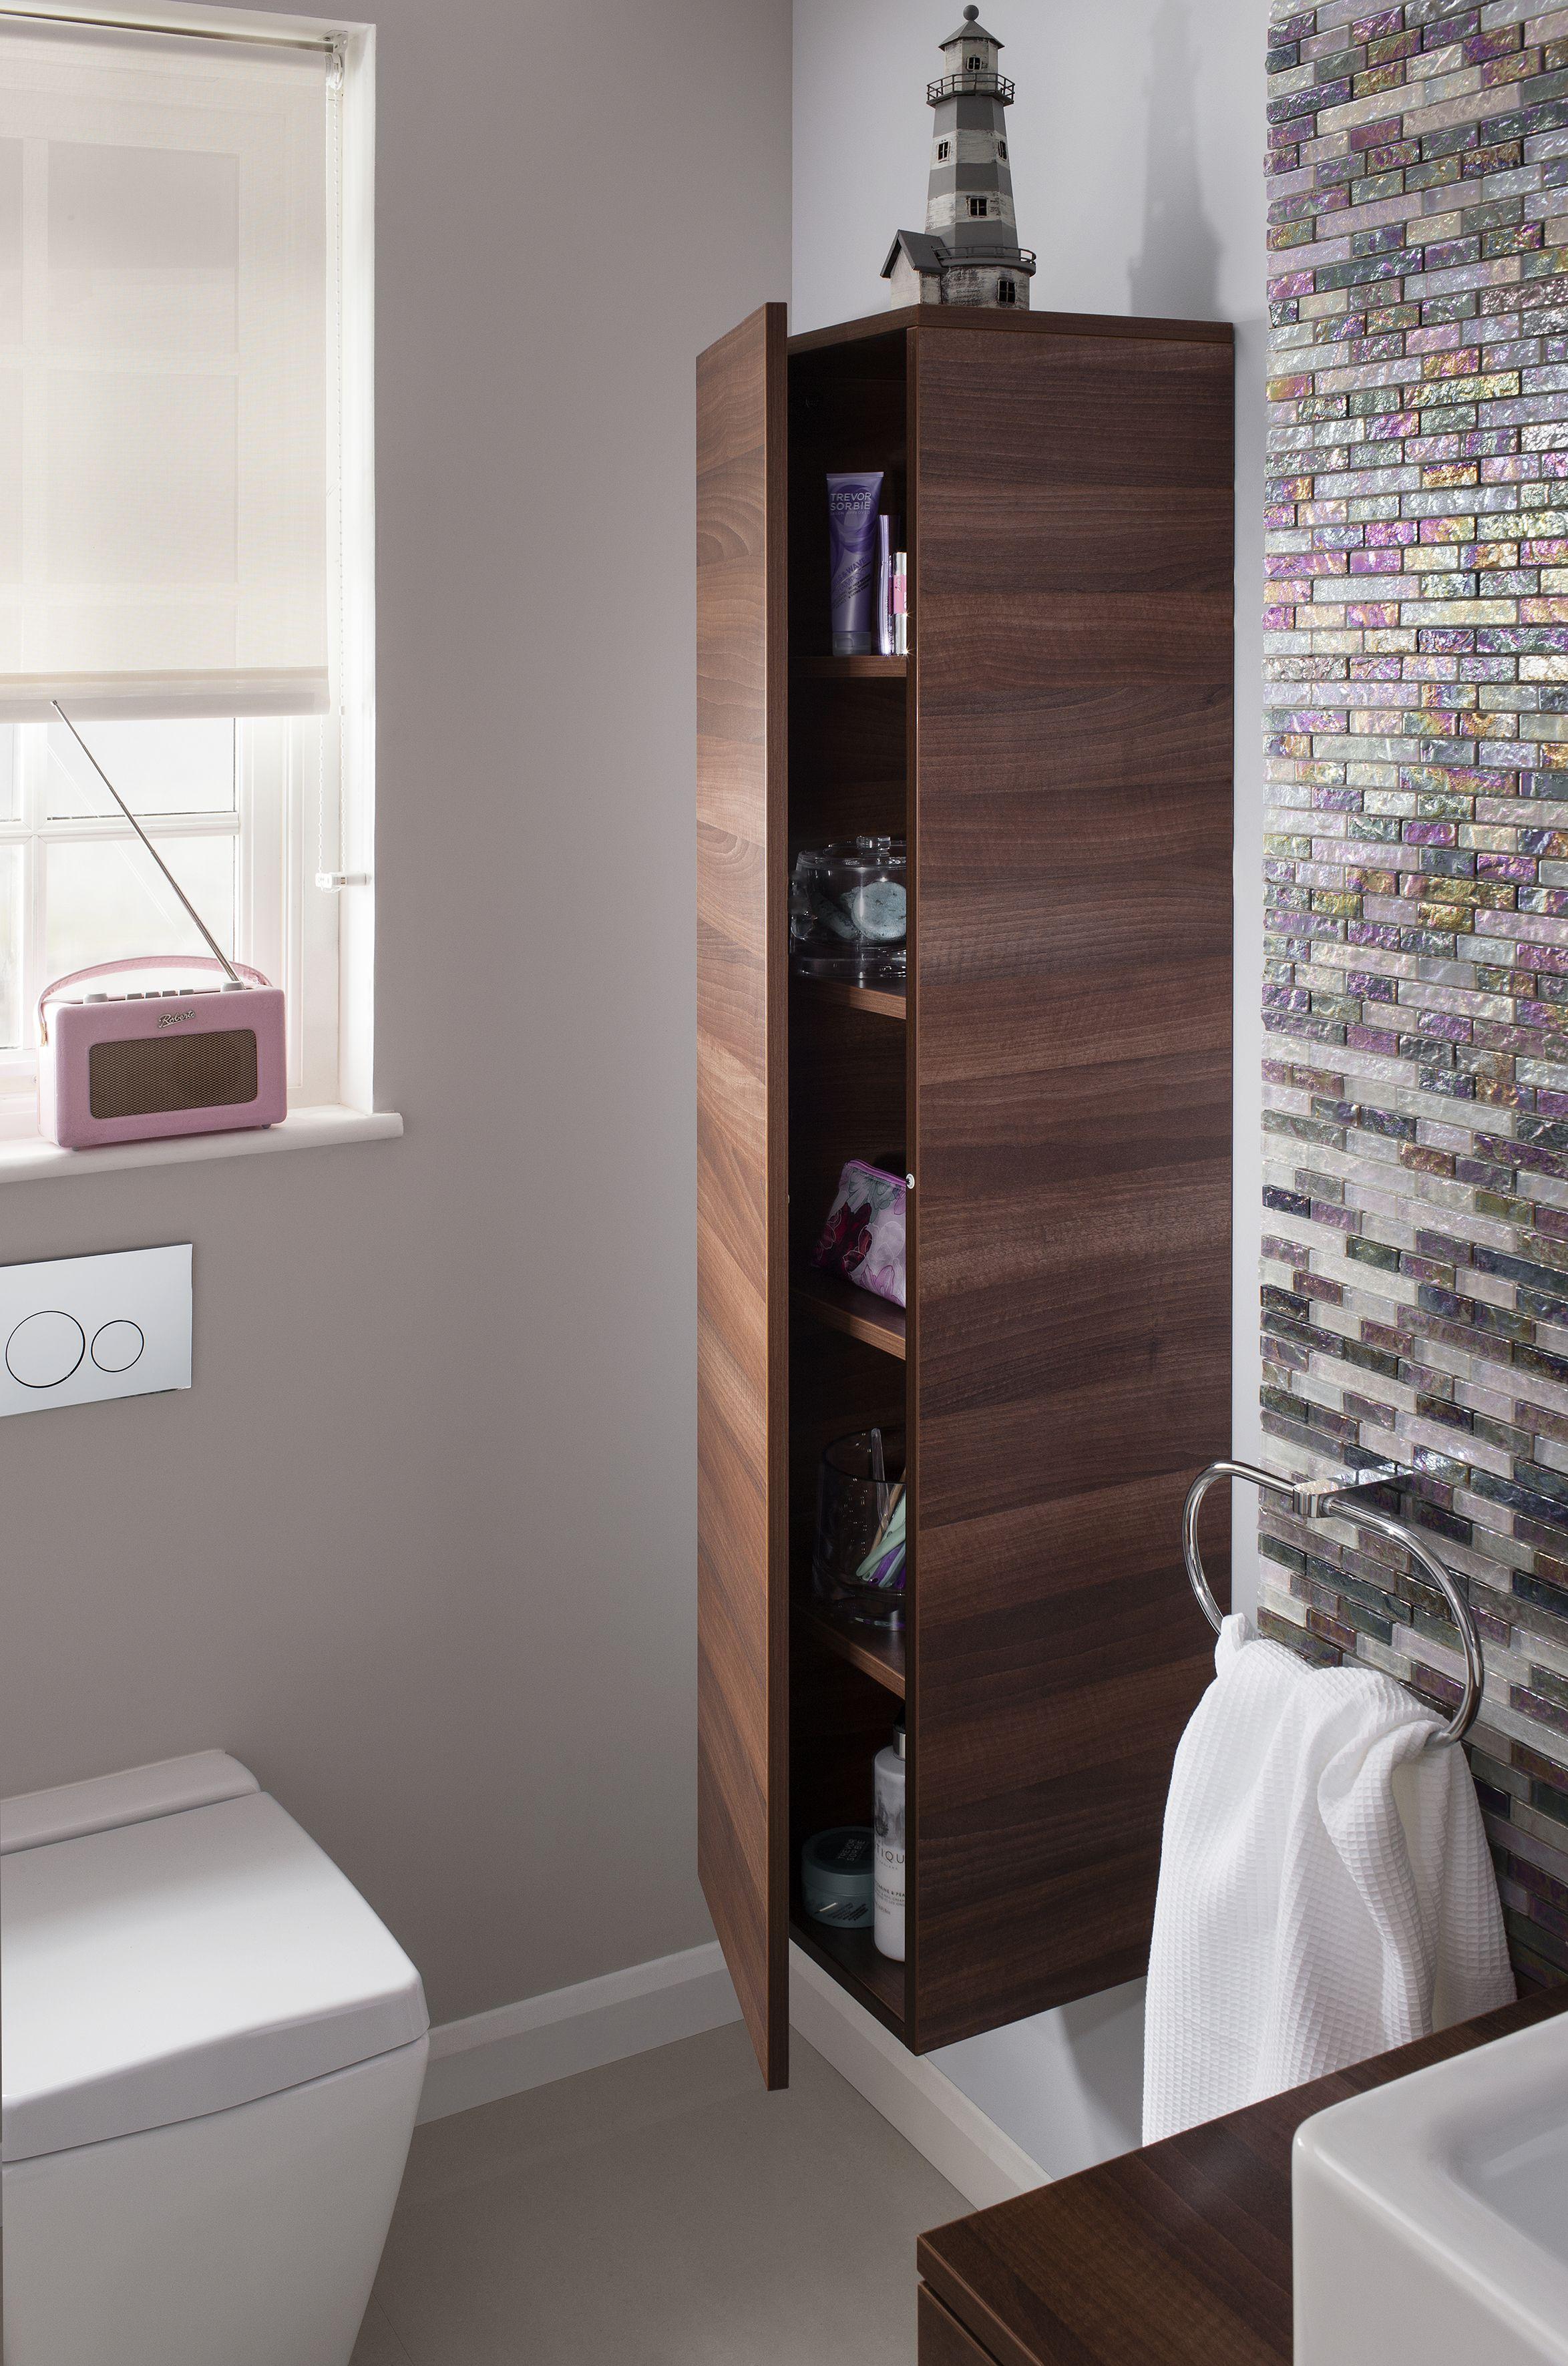 Seattle Walnut Bathroom Furniture Range From Crosswater Httpwww - Bathroom furniture seattle